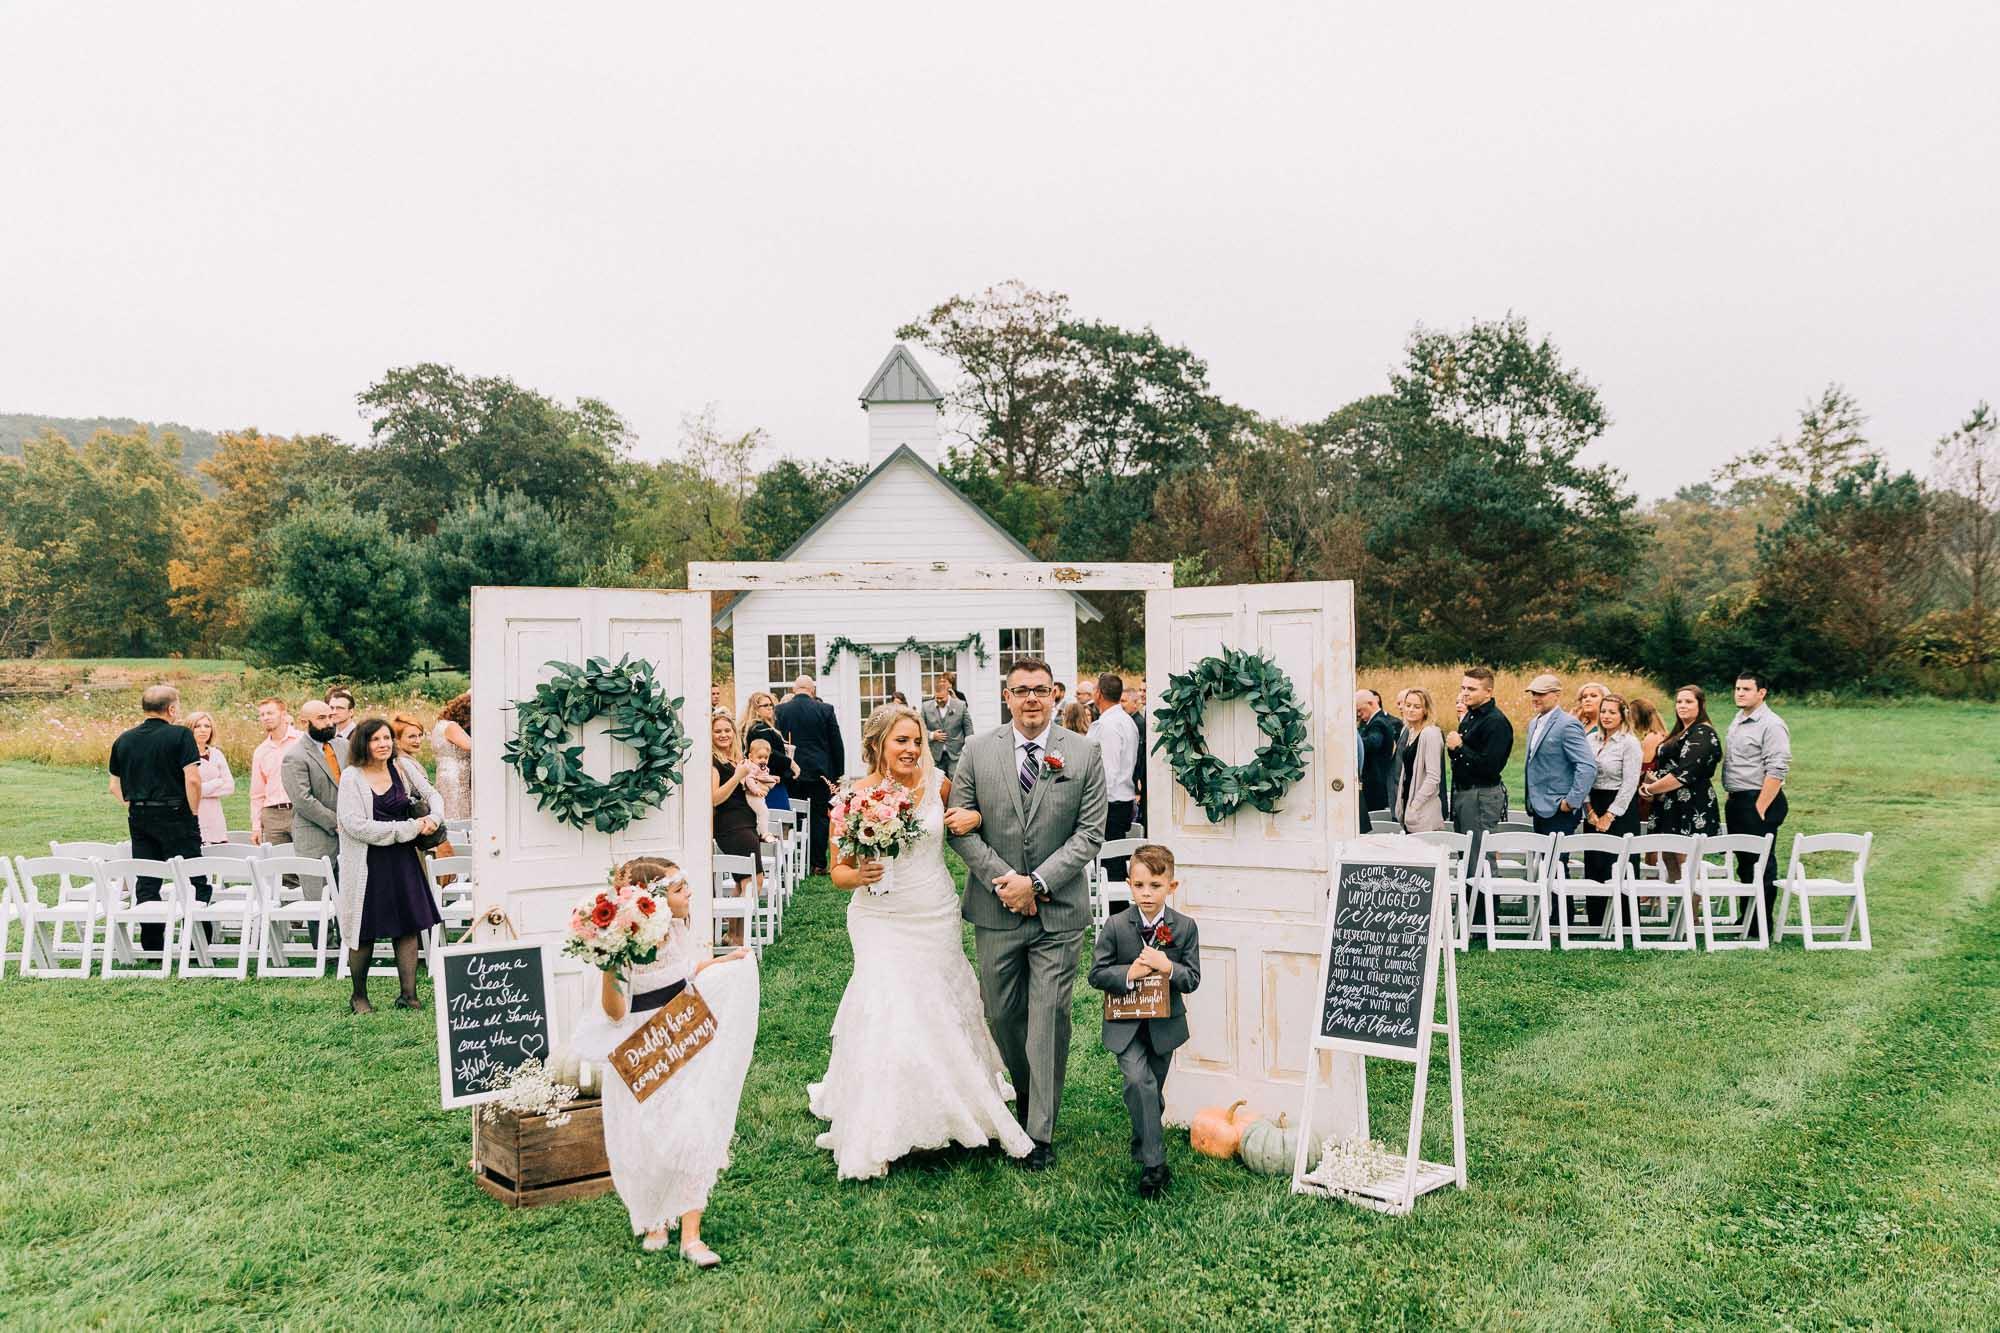 Lodge-at-Raven-Creek-October-wedding-37.jpg